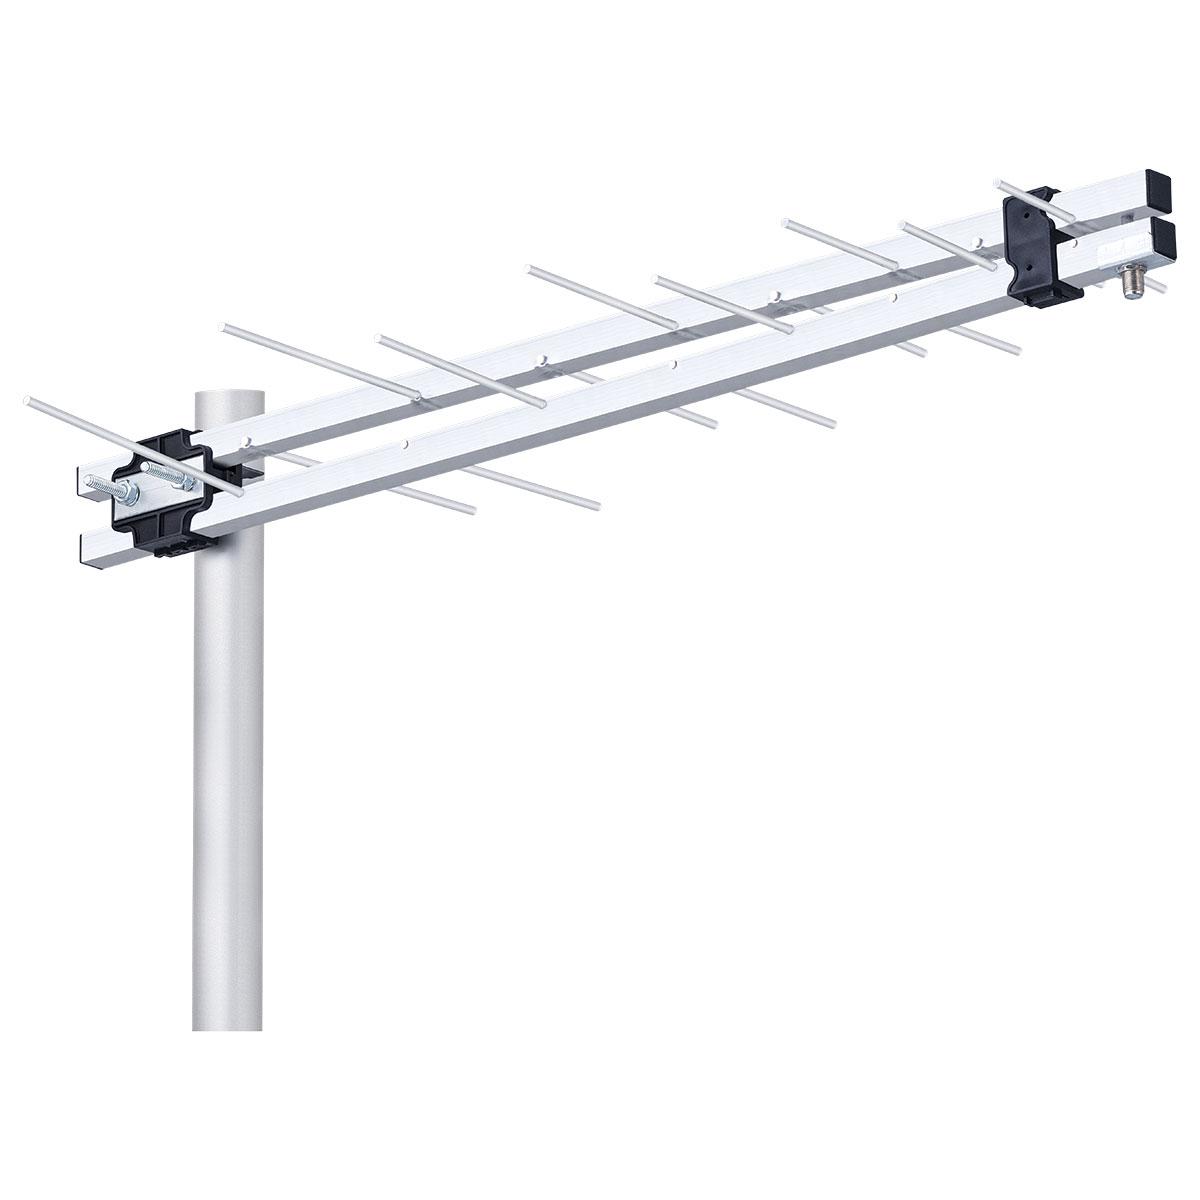 ANTENA EXTERNA LOG PERIÓDICA UHF HDTV 8 ELEMENTOS POP 11DBI LU-8P